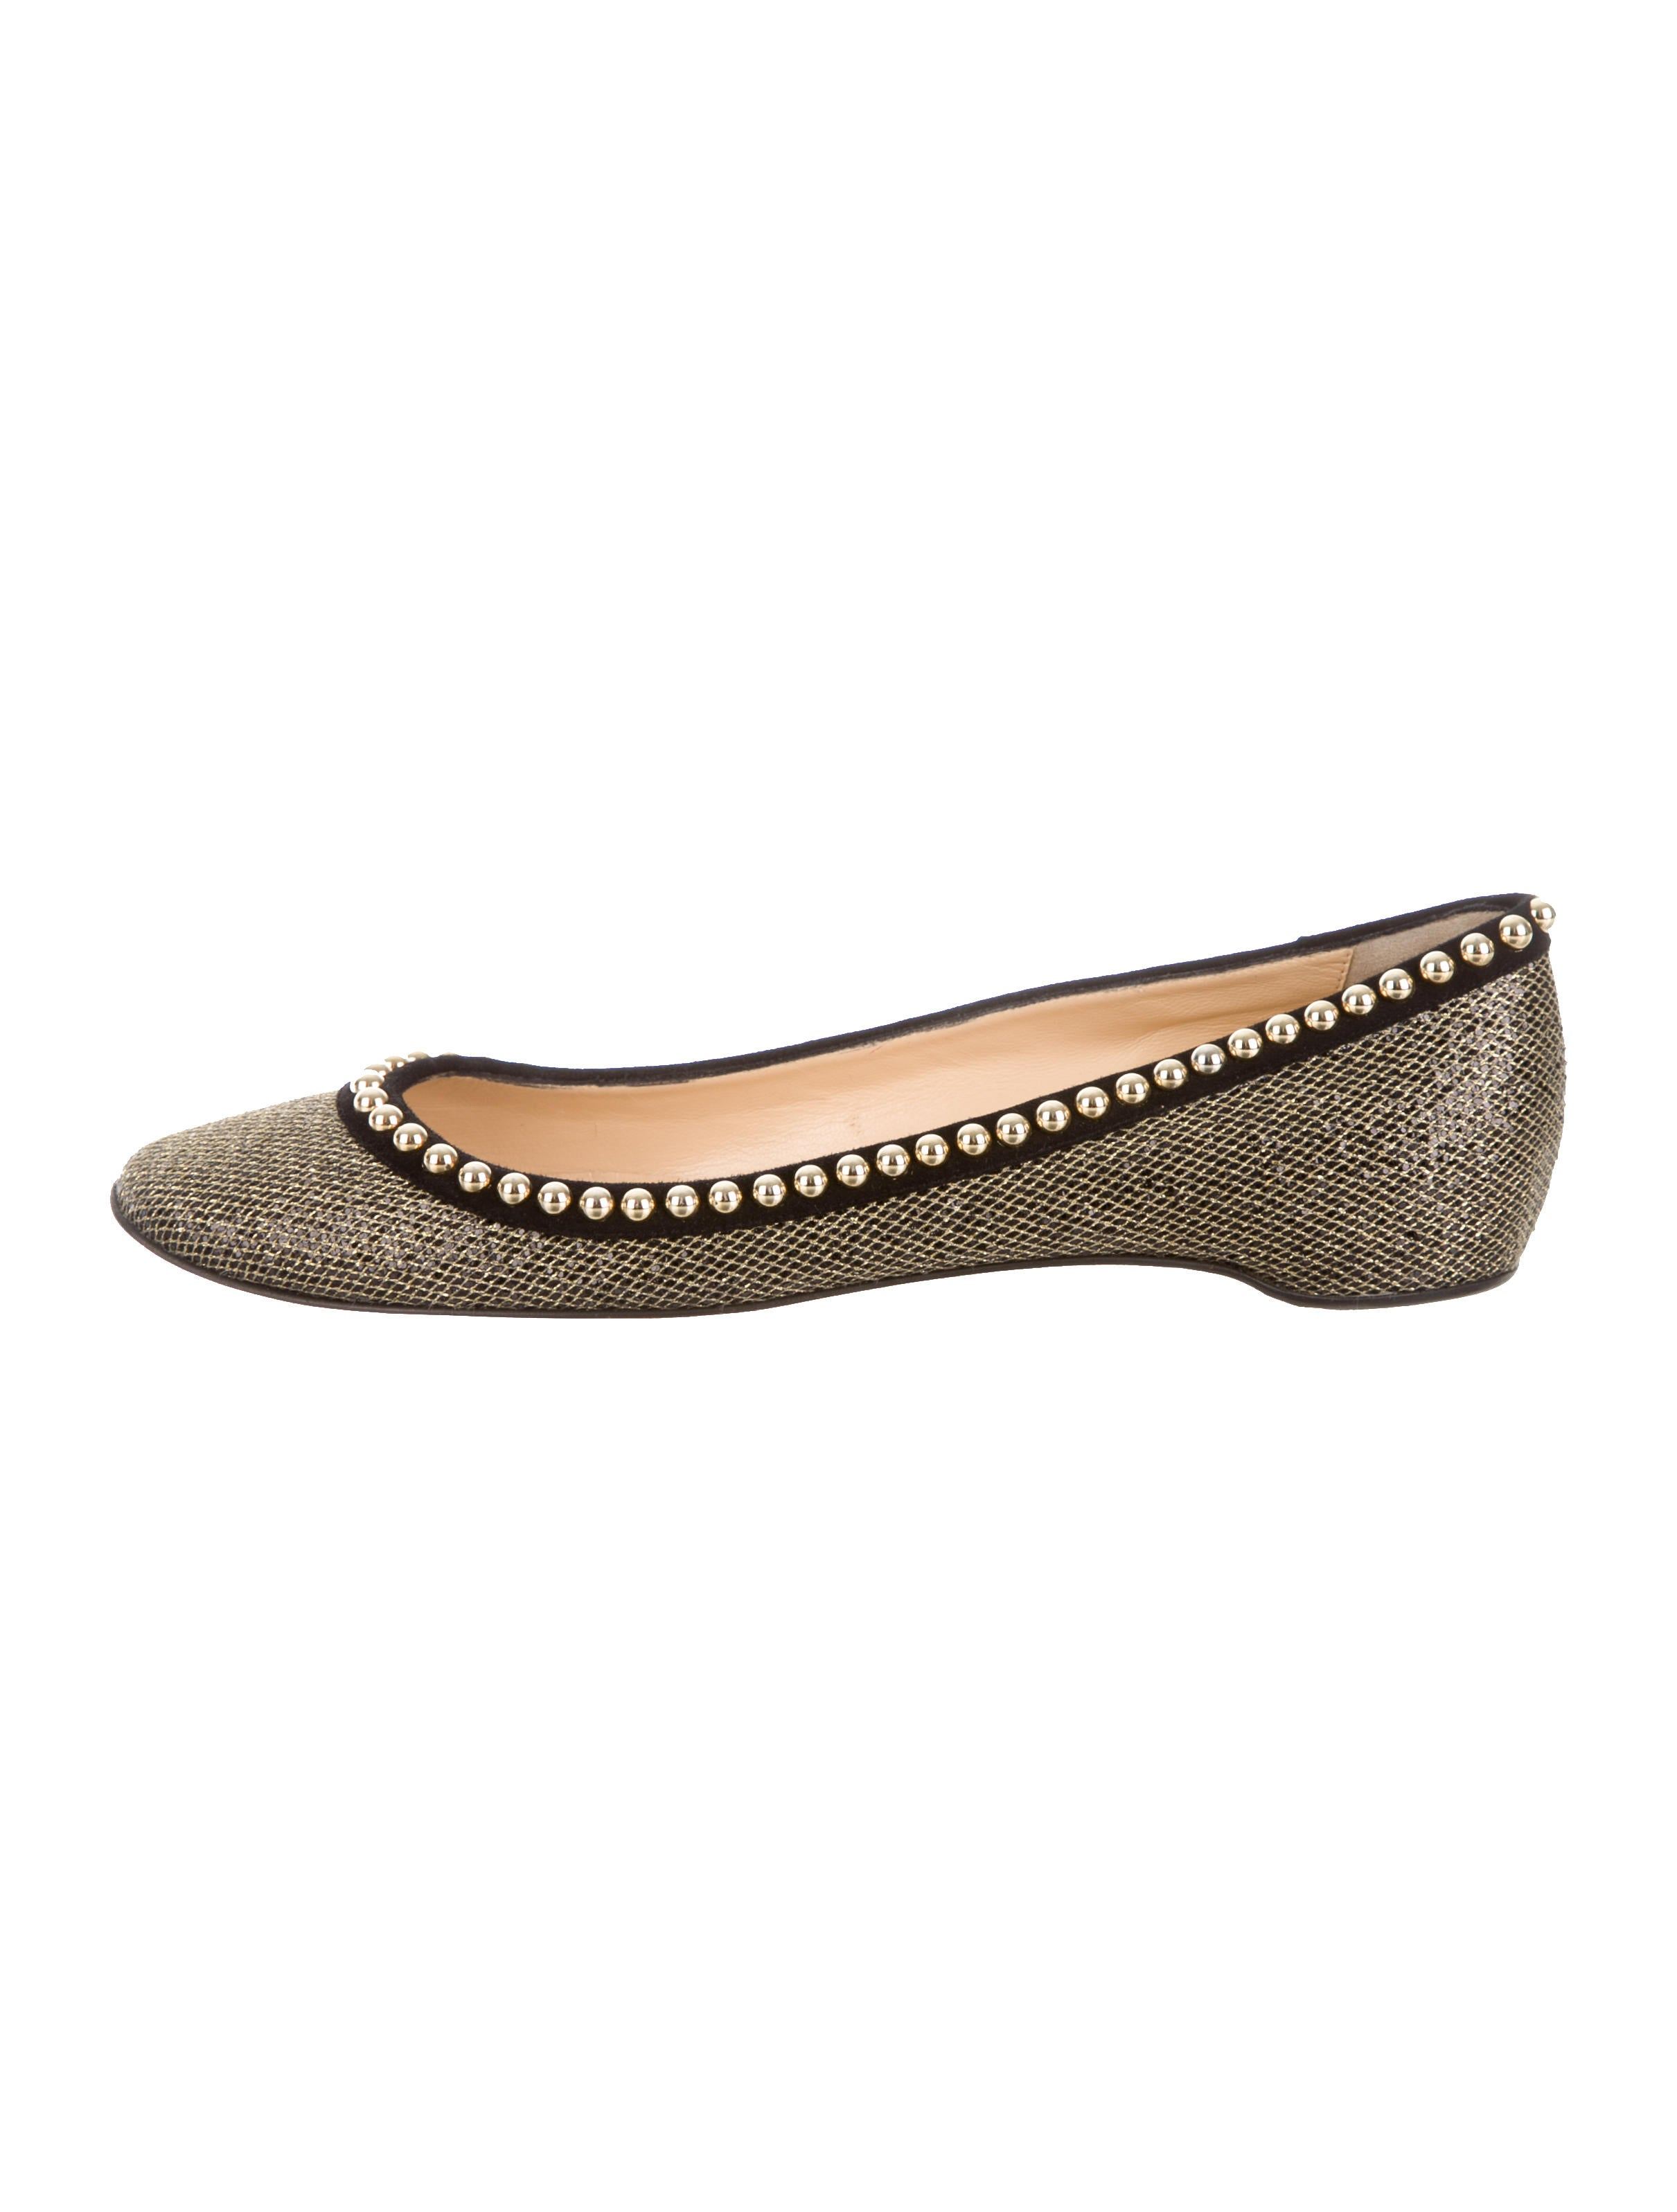 Christian Louboutin Glitter Round-Toe Flats - Shoes - CHT43435 ...